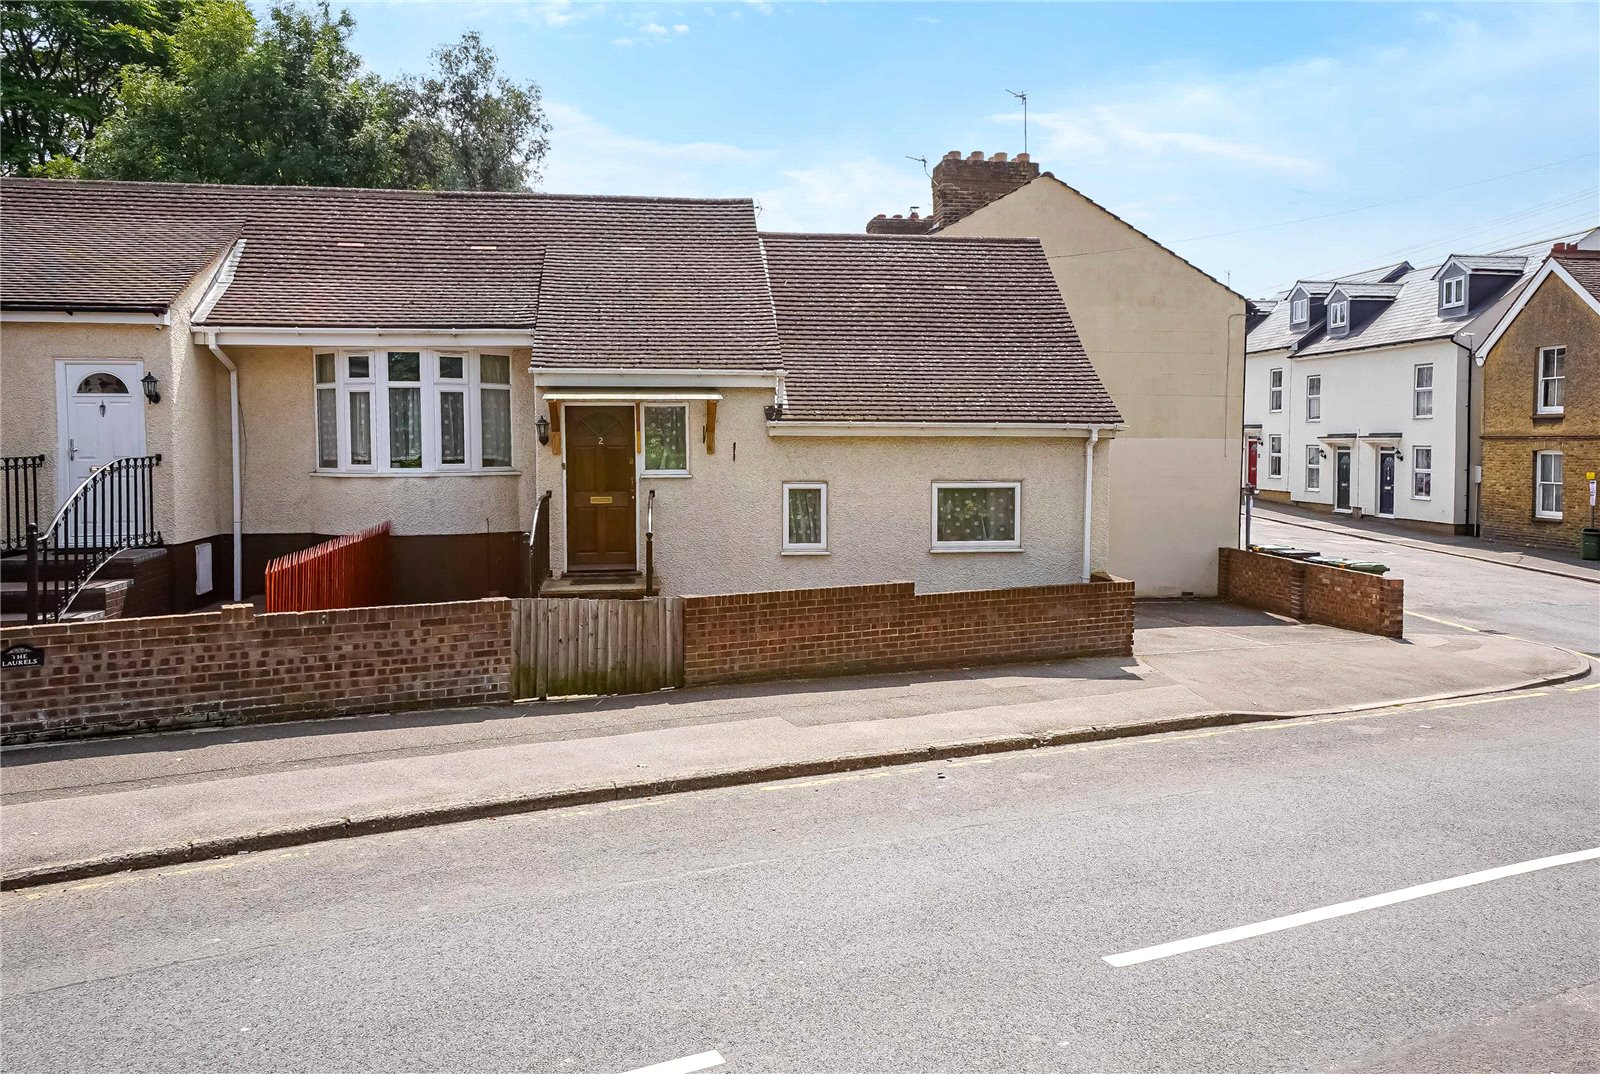 2 bed bungalow for sale in The Laurels, Peel Street, ME14